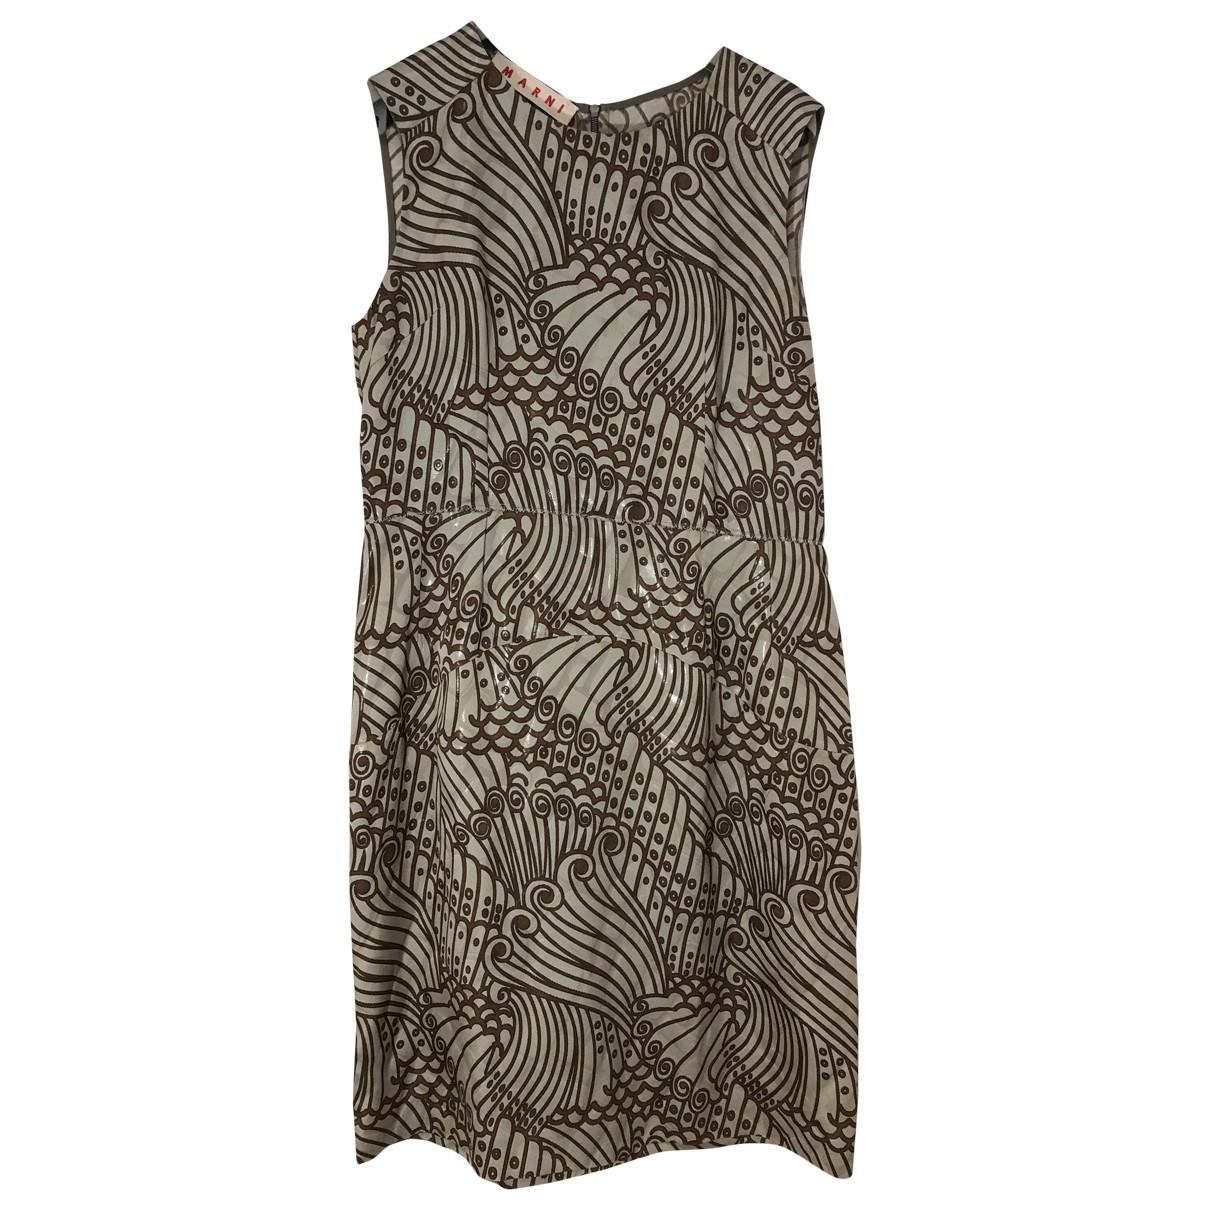 Marni \N Kleid in  Gruen Polyester